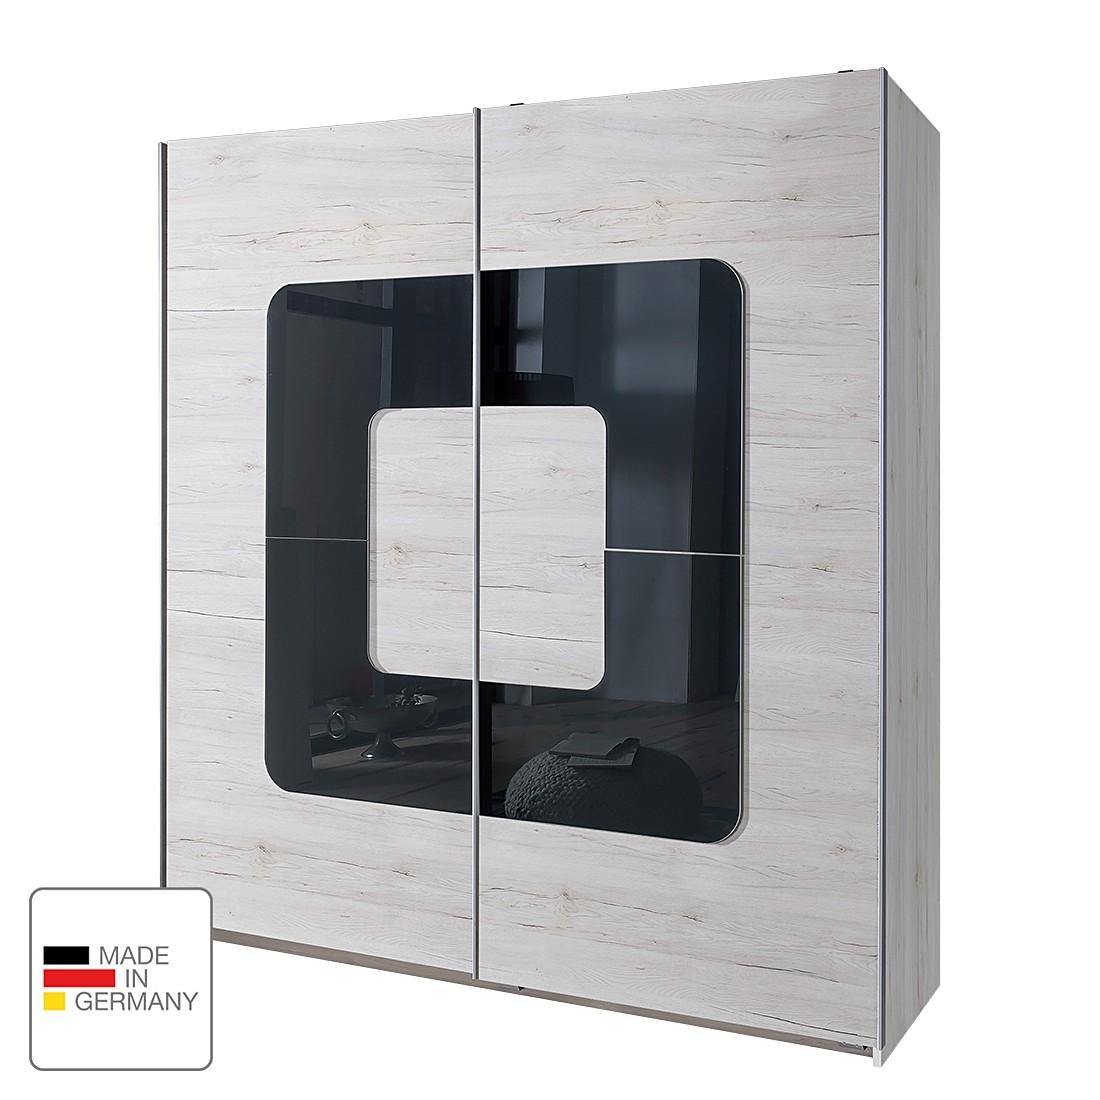 Schuifdeurkast Curve - Wit eikenhout/grijs glas, Wimex